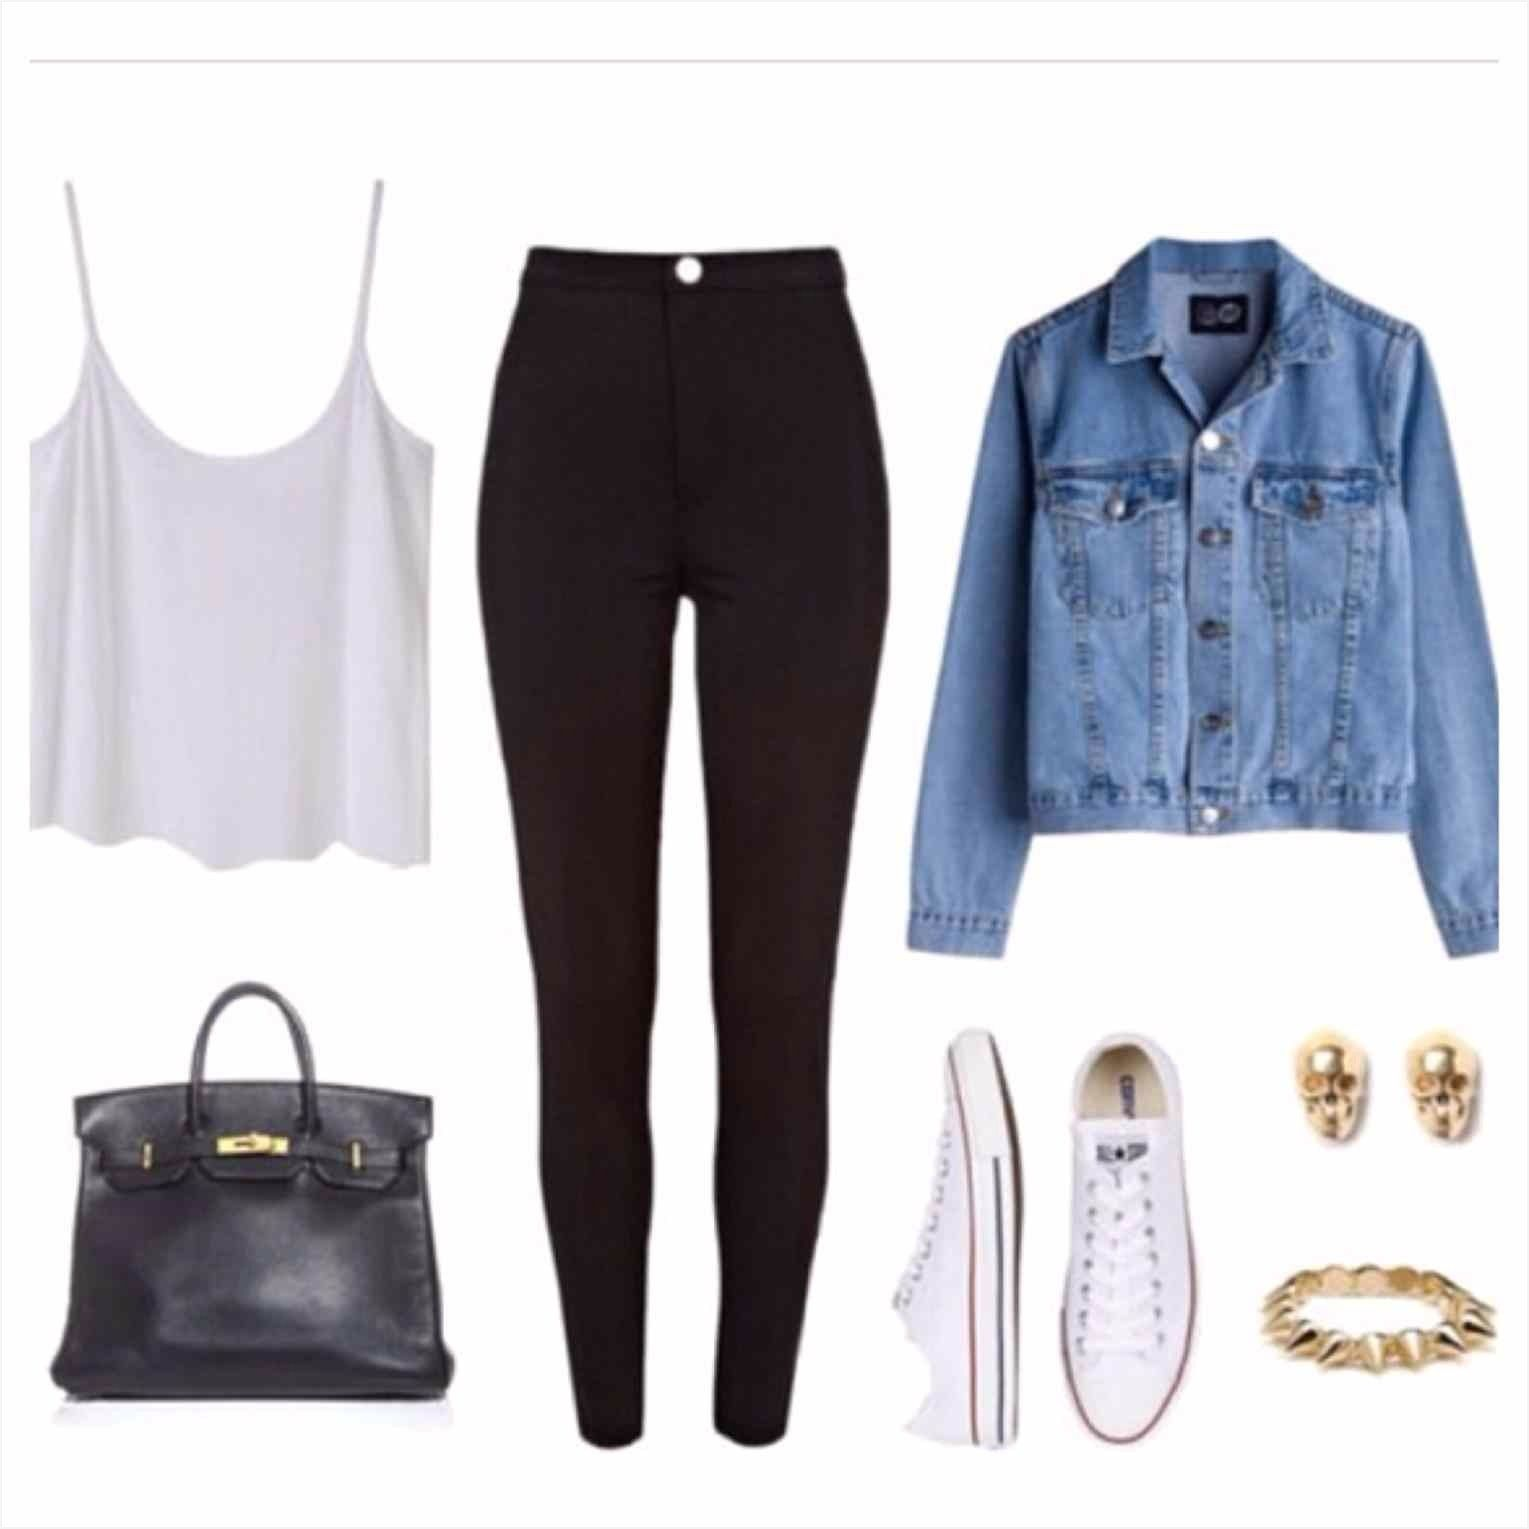 21++ Cute outfit ideas tumblr ideas